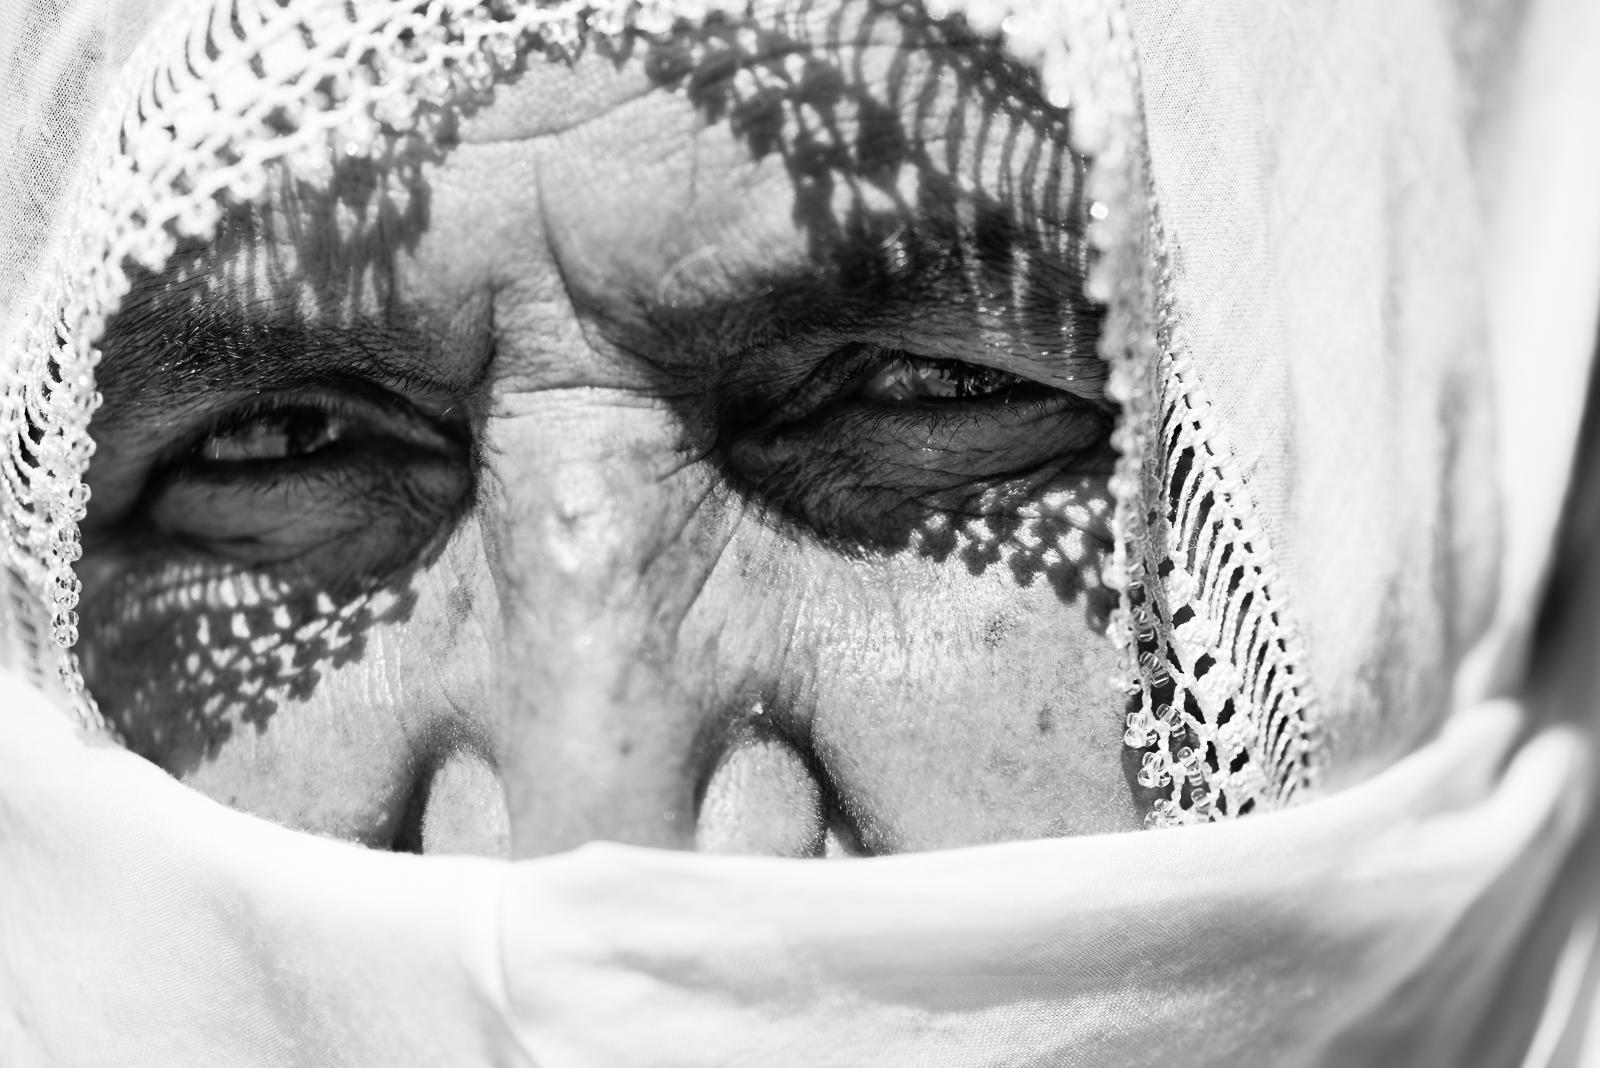 The face of an elder kurdish woman in Diyarbakir, Turkey.